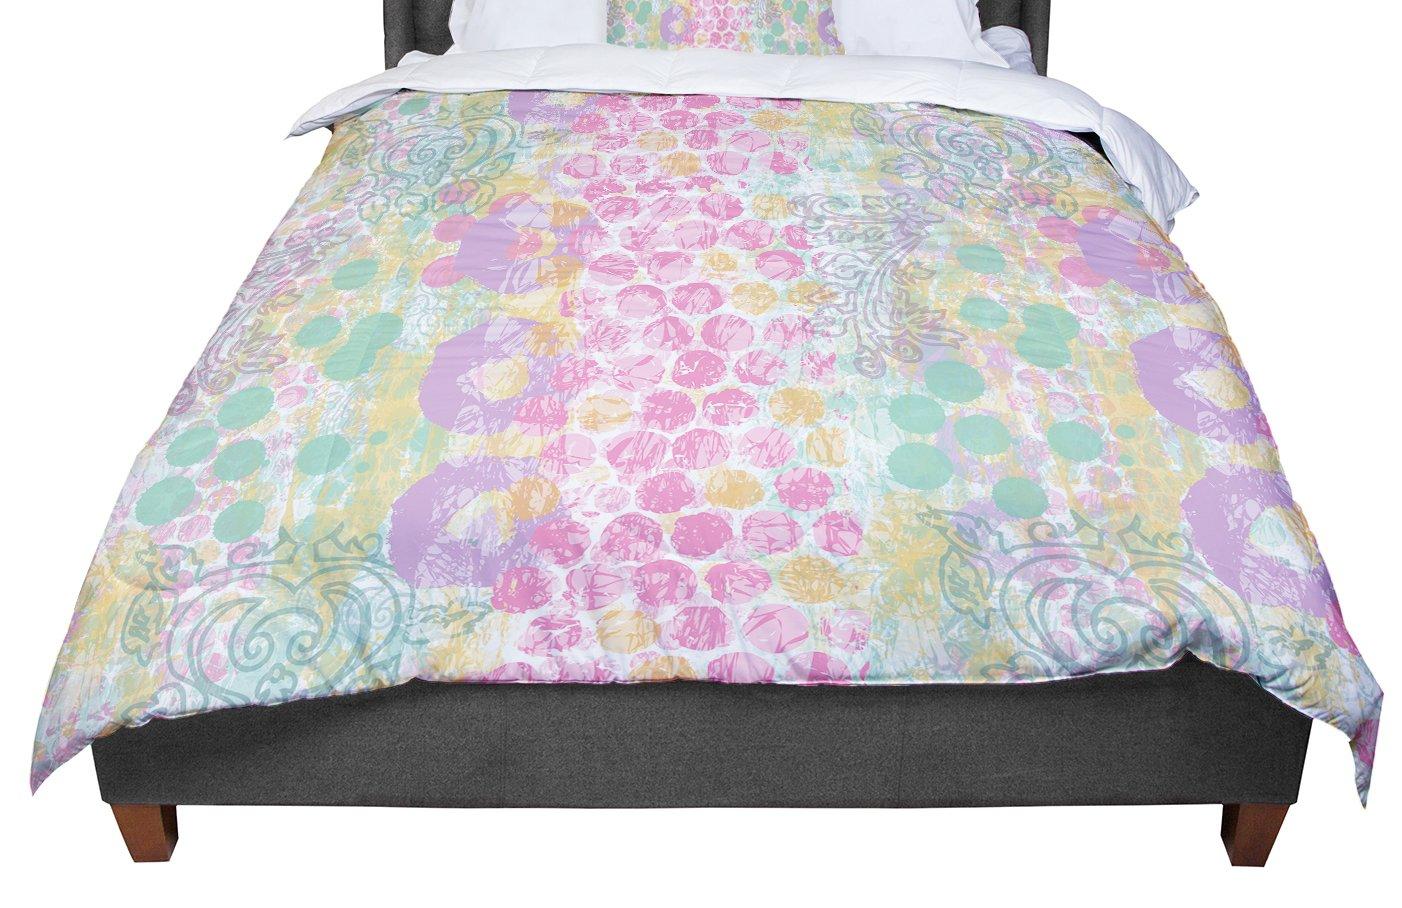 KESS InHouse Chickaprint 'Impression' Pastel Mix Queen Comforter, 88' X 88'